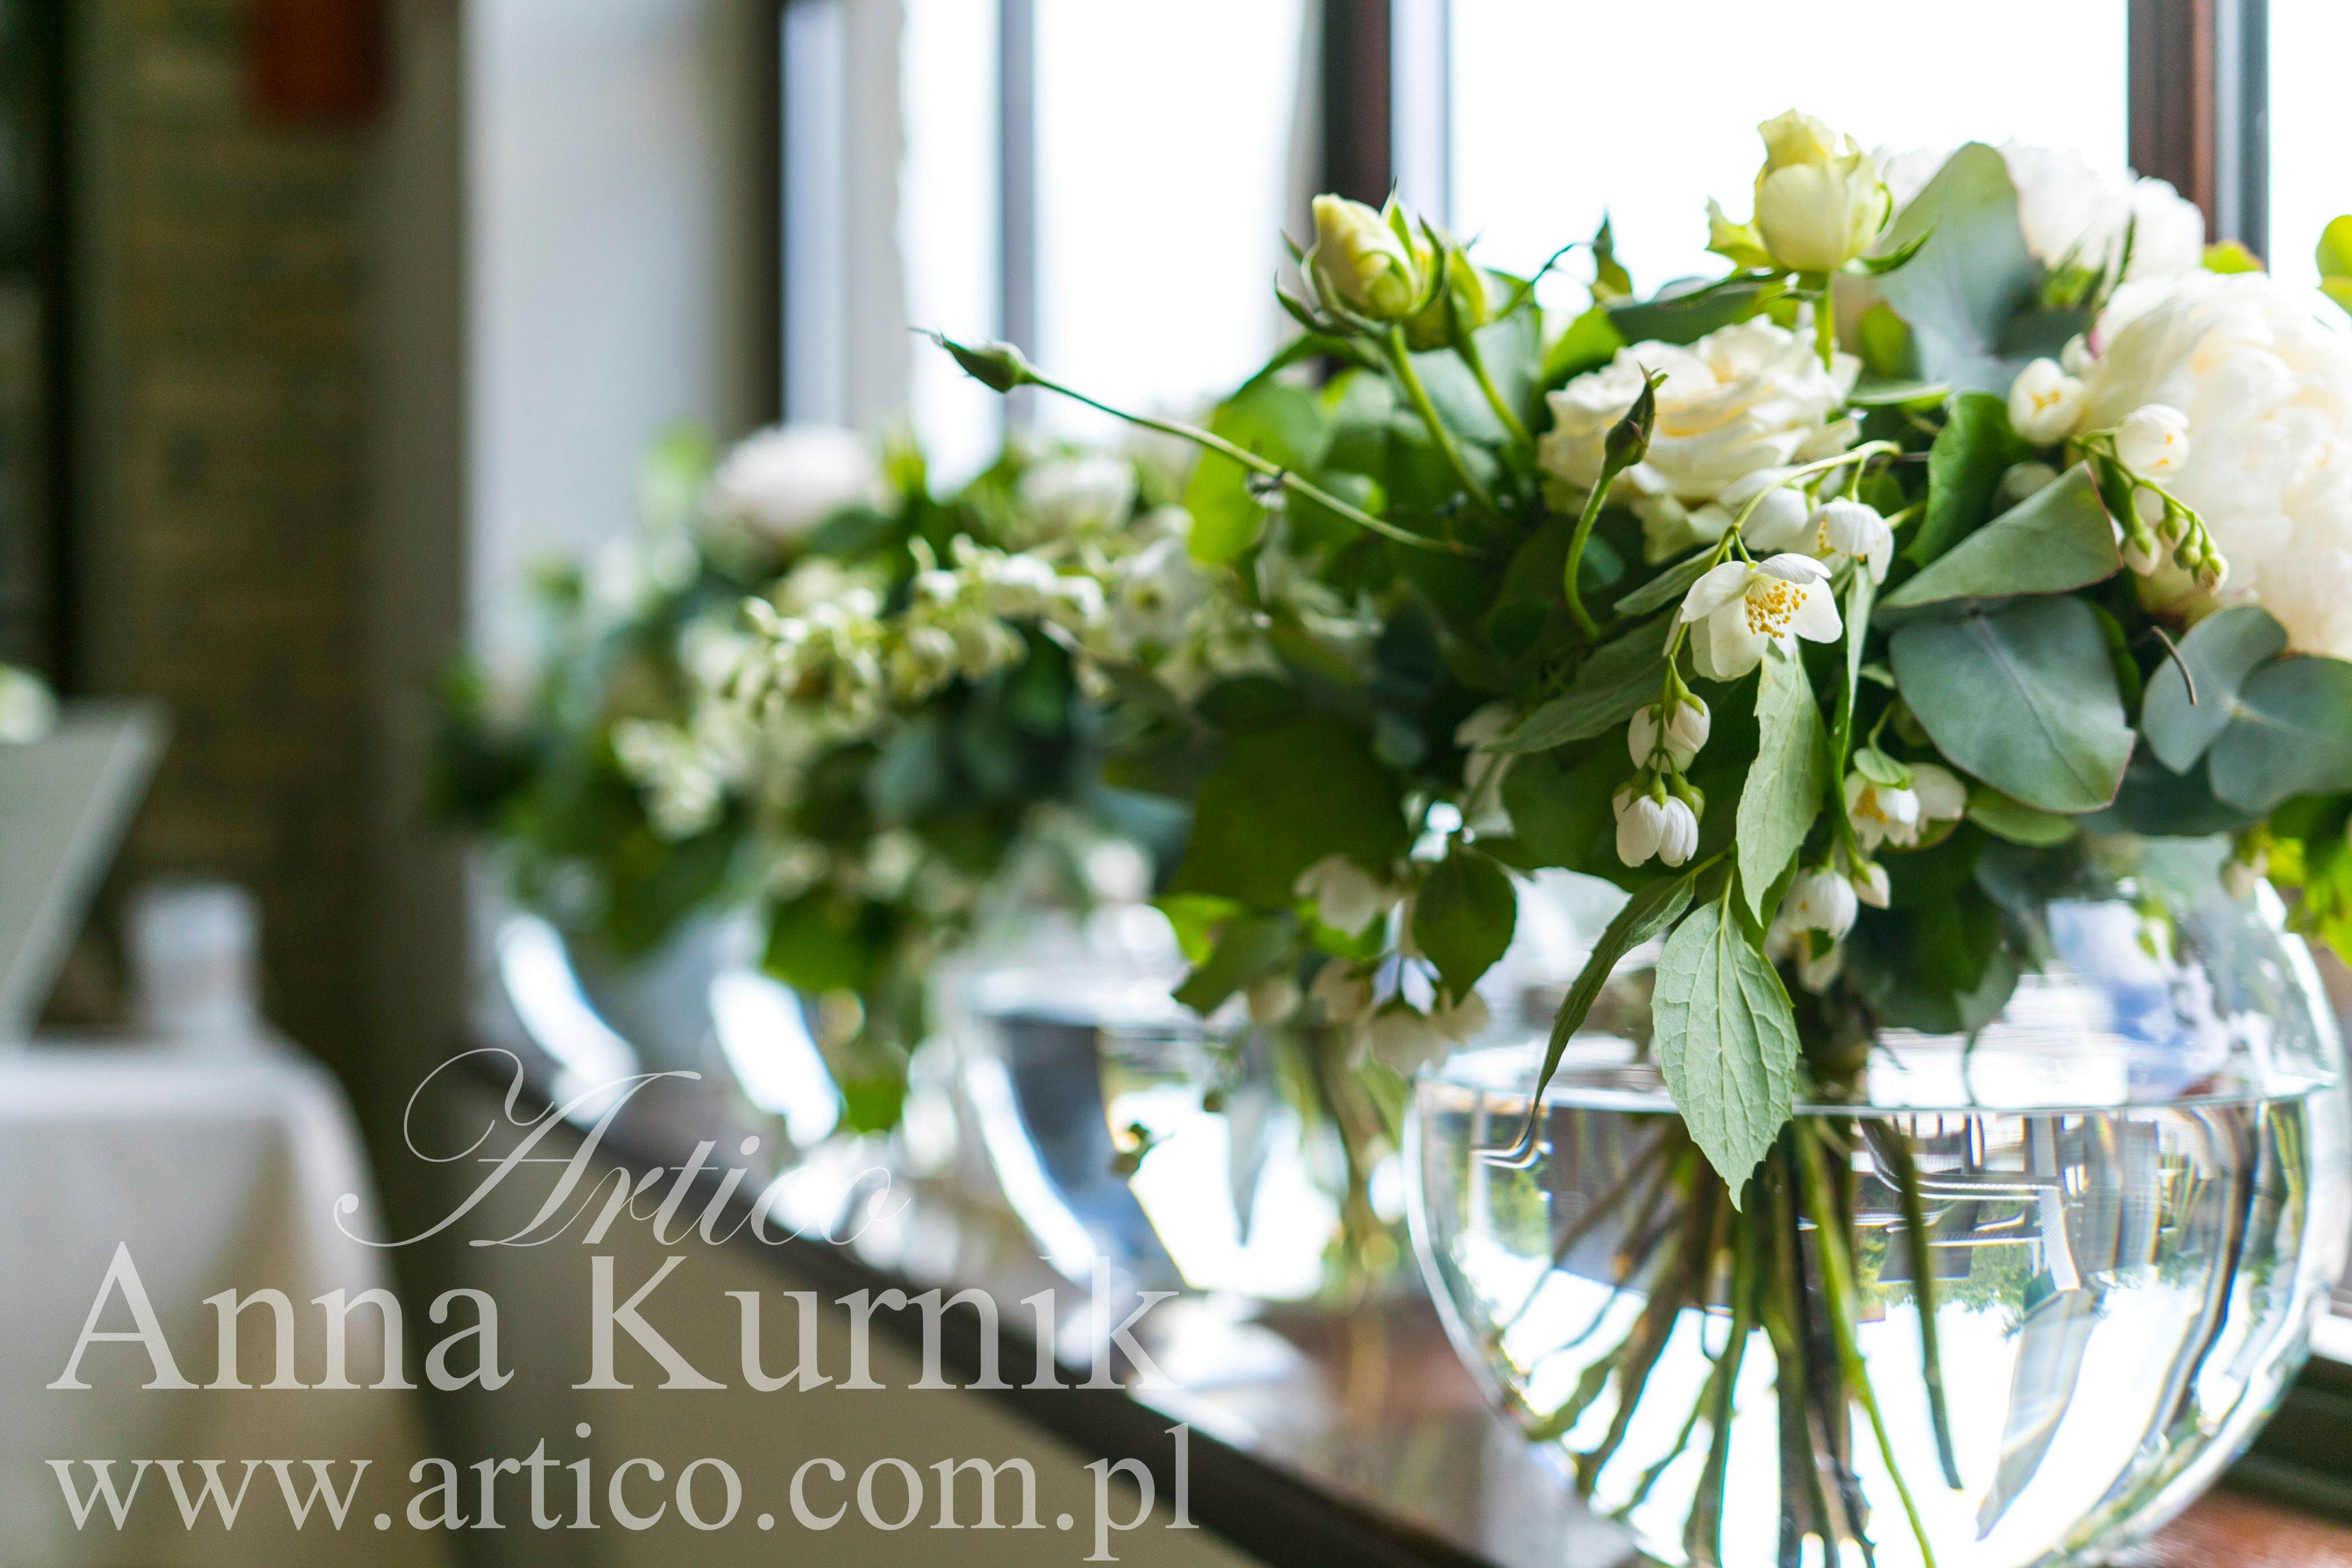 Bukiety W Stylu Rustykalnym Biale Kwiaty Eukaliptus Duze Kule Szklo Piekna Sala Table Decorations Vase Facebook Sign Up